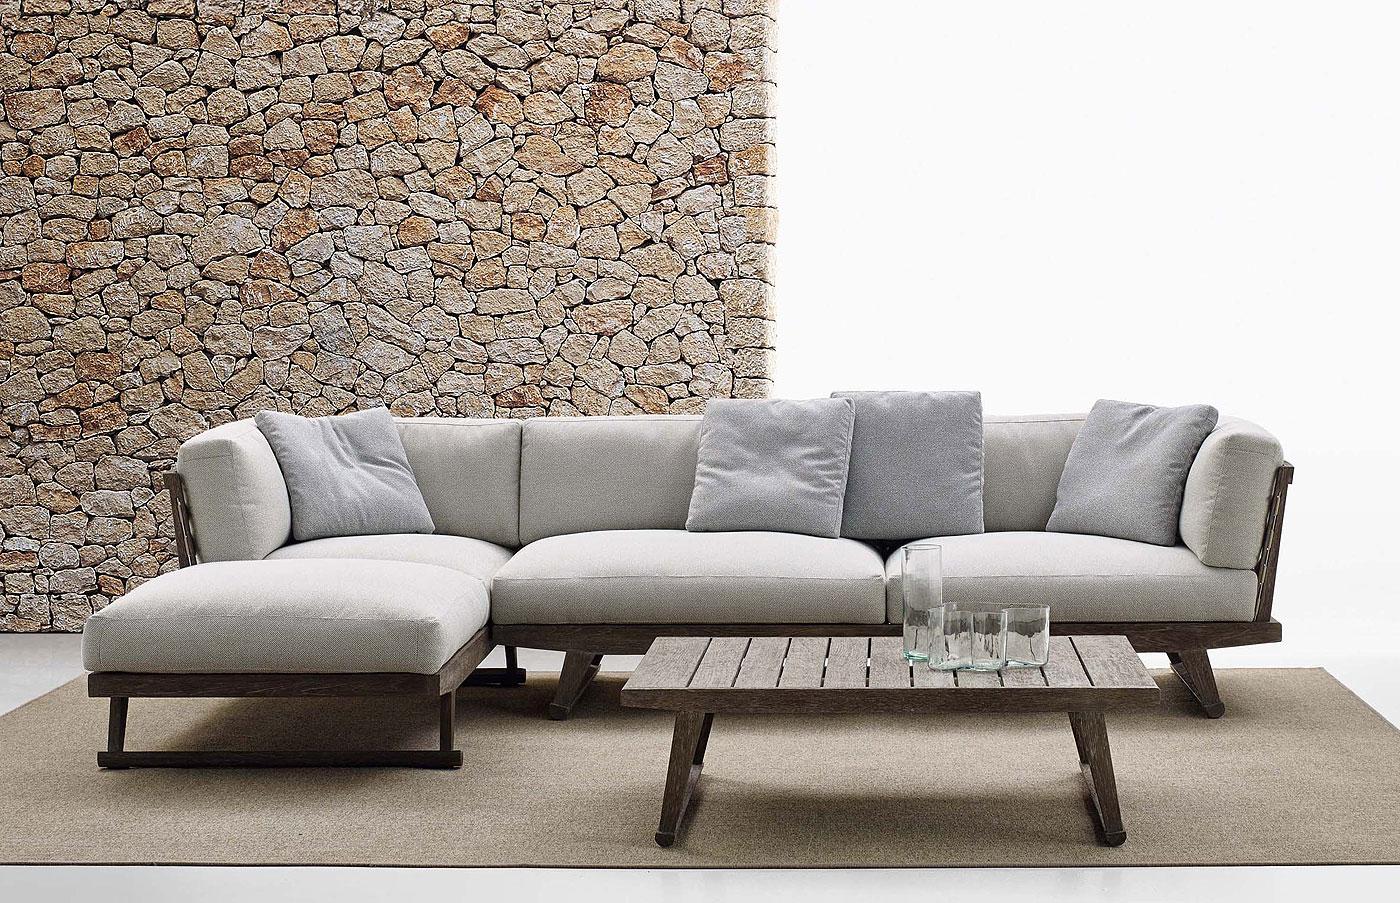 mobiliario-gio-outdoor-gio-antonio-citterio-B&B-Italia (1)